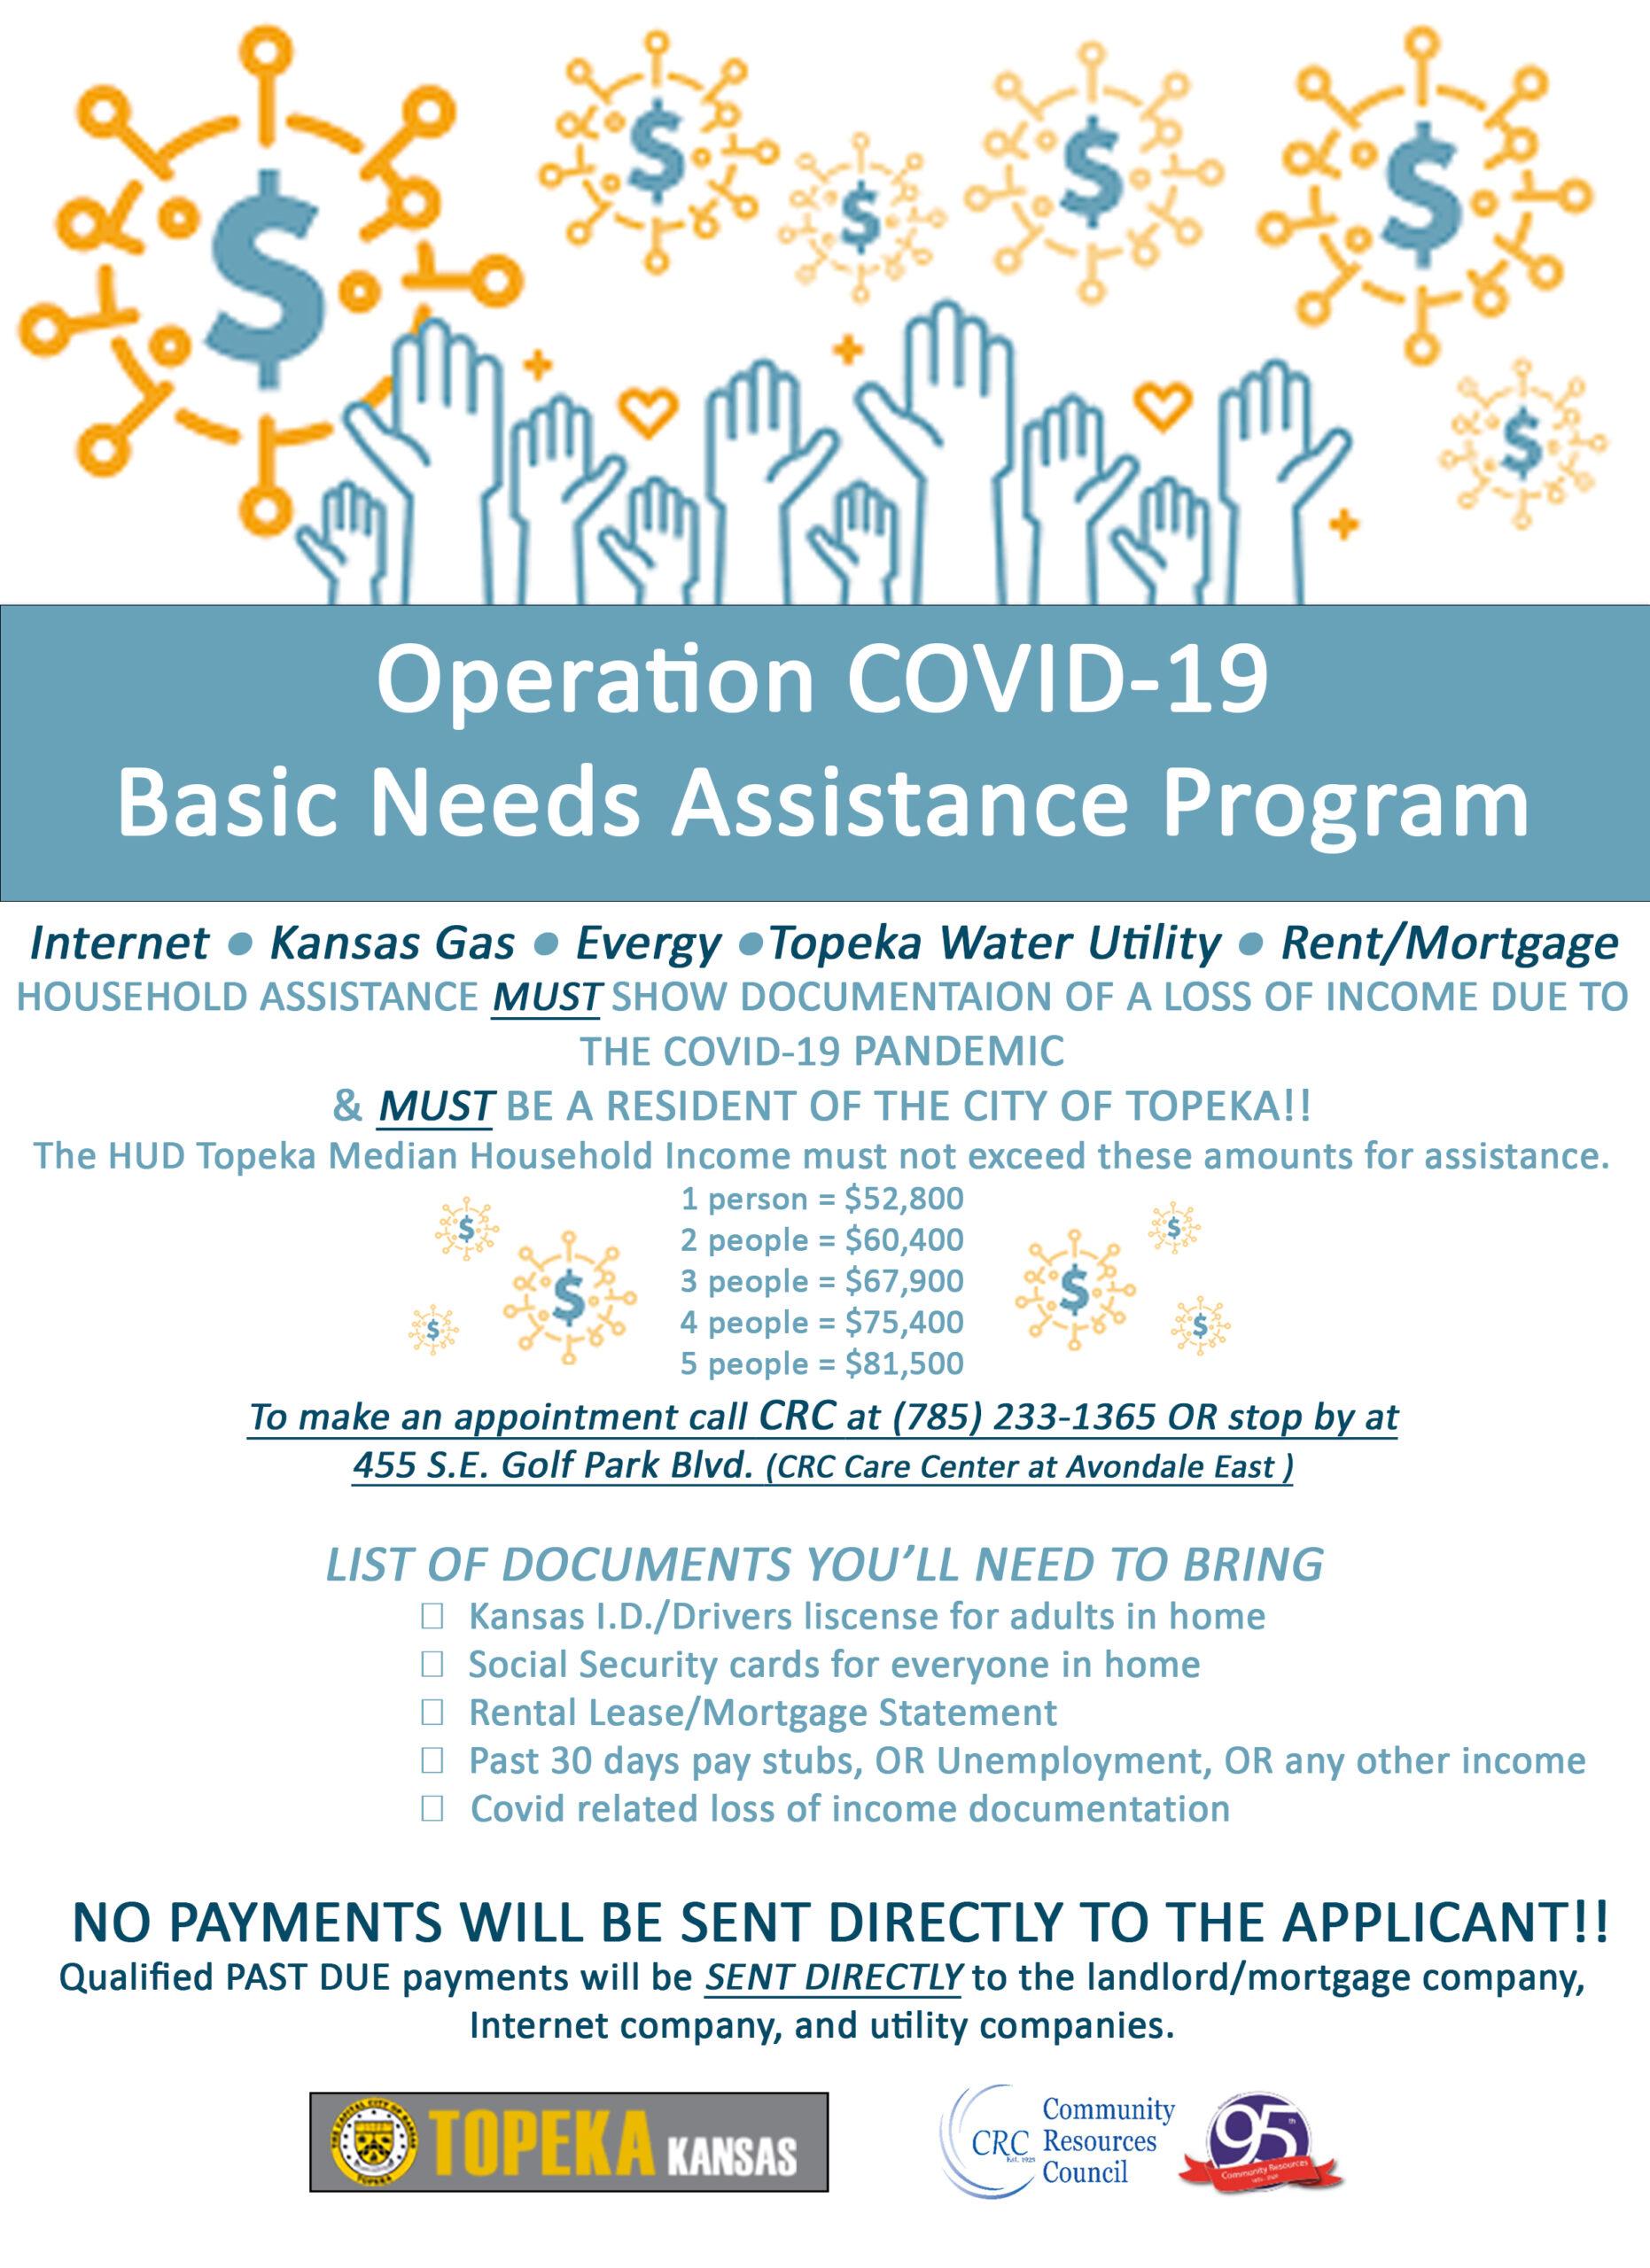 Operation COVID-19 Basic Needs Assistance Program